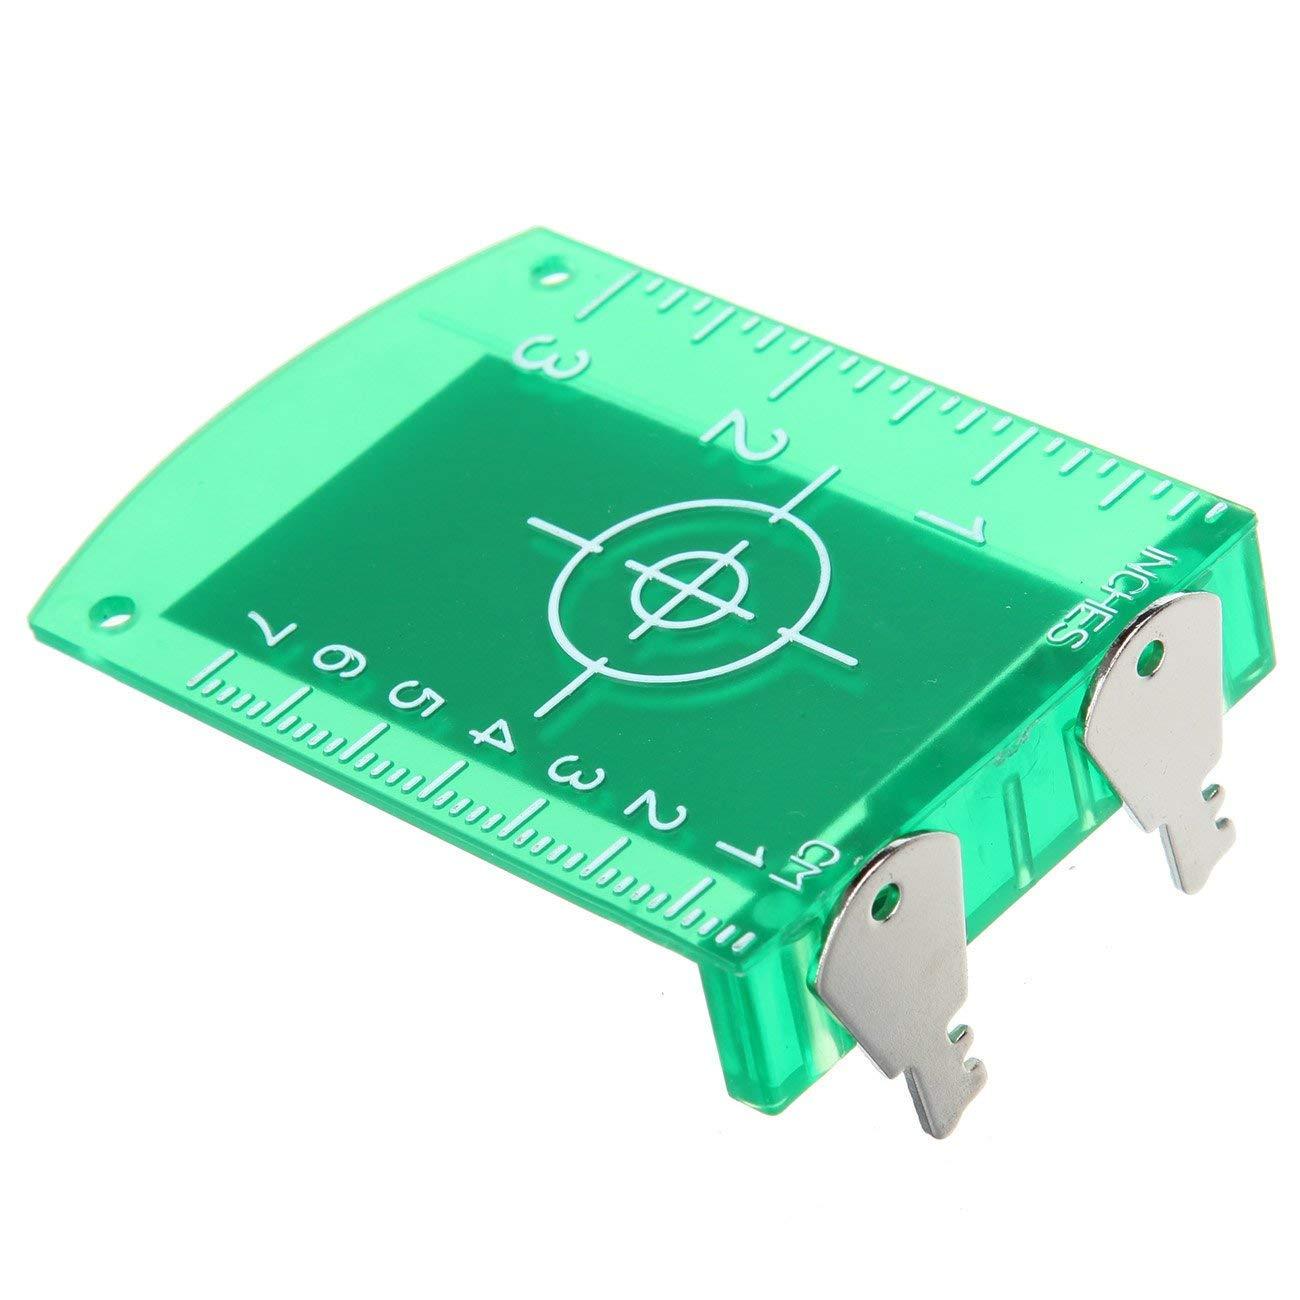 MuGuang Adjustable Green Beam Automatic Self Leveling Measuring Rotary Rotating Laser Level 500m Range Green Laser